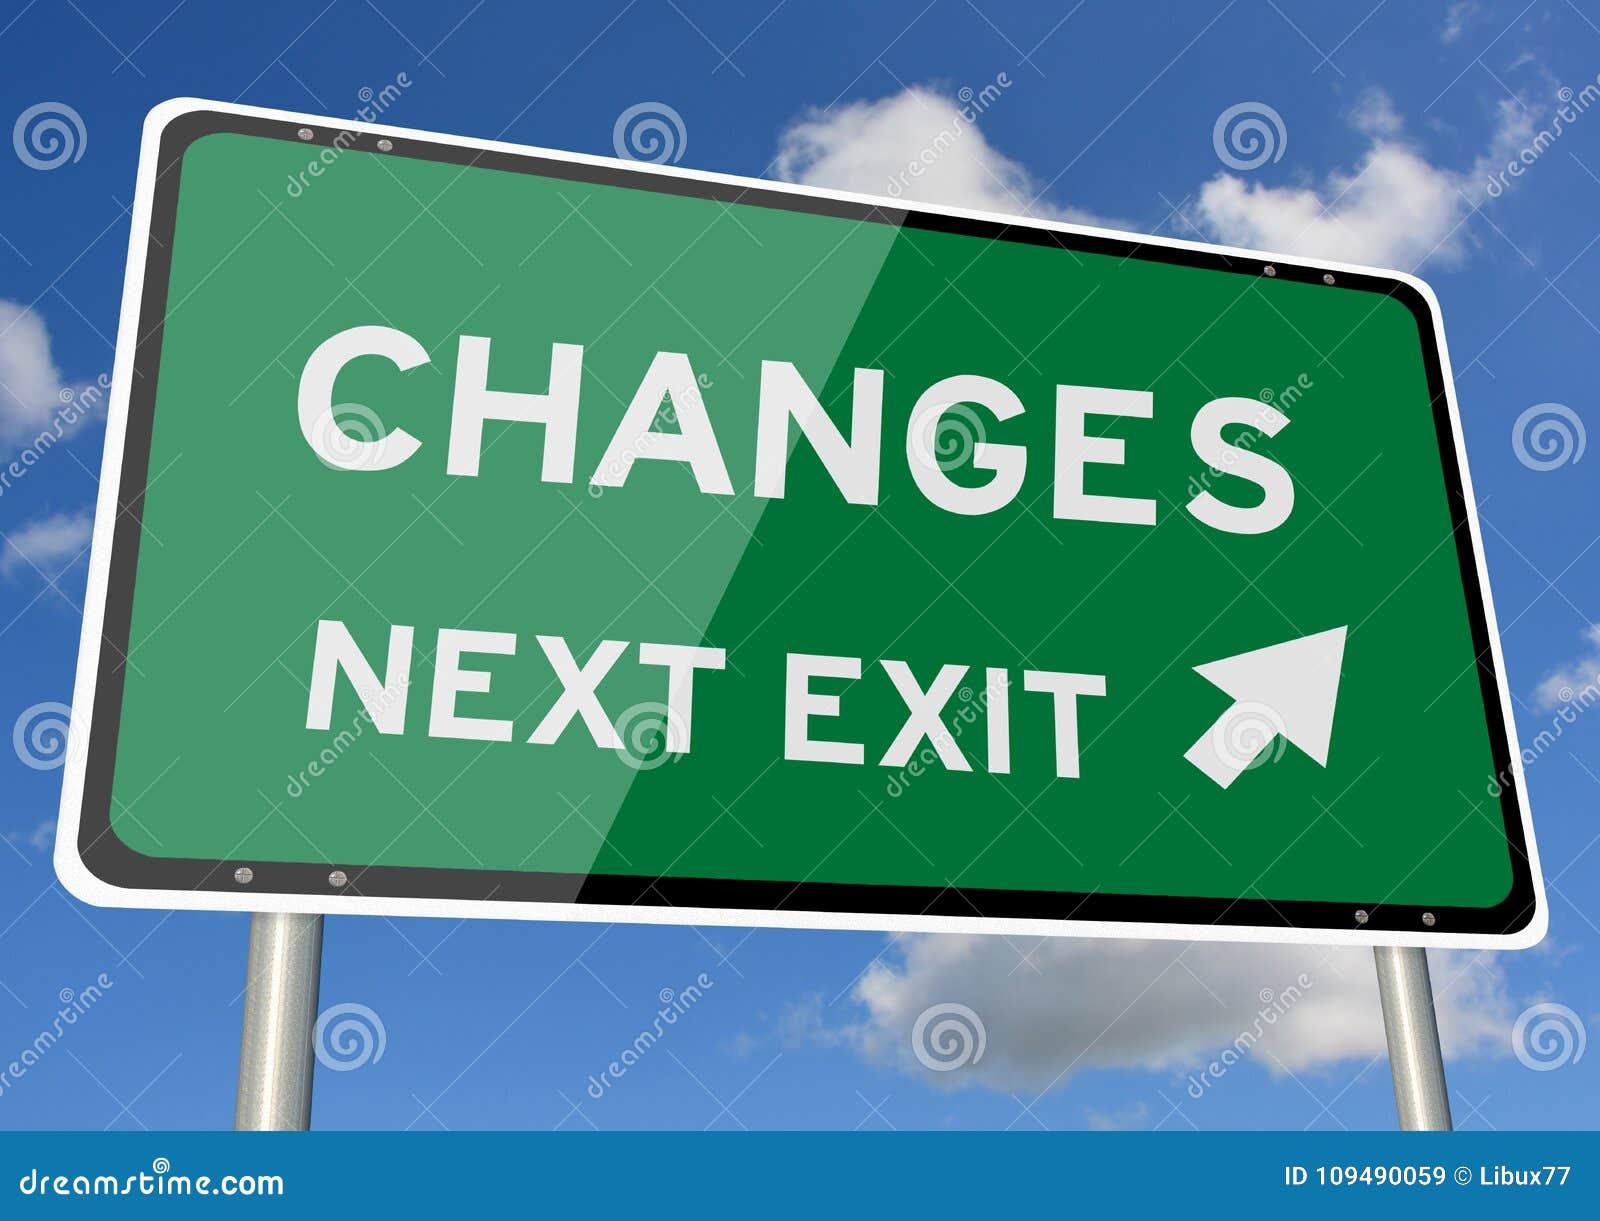 Changes signpost roadsign next exit blue sky